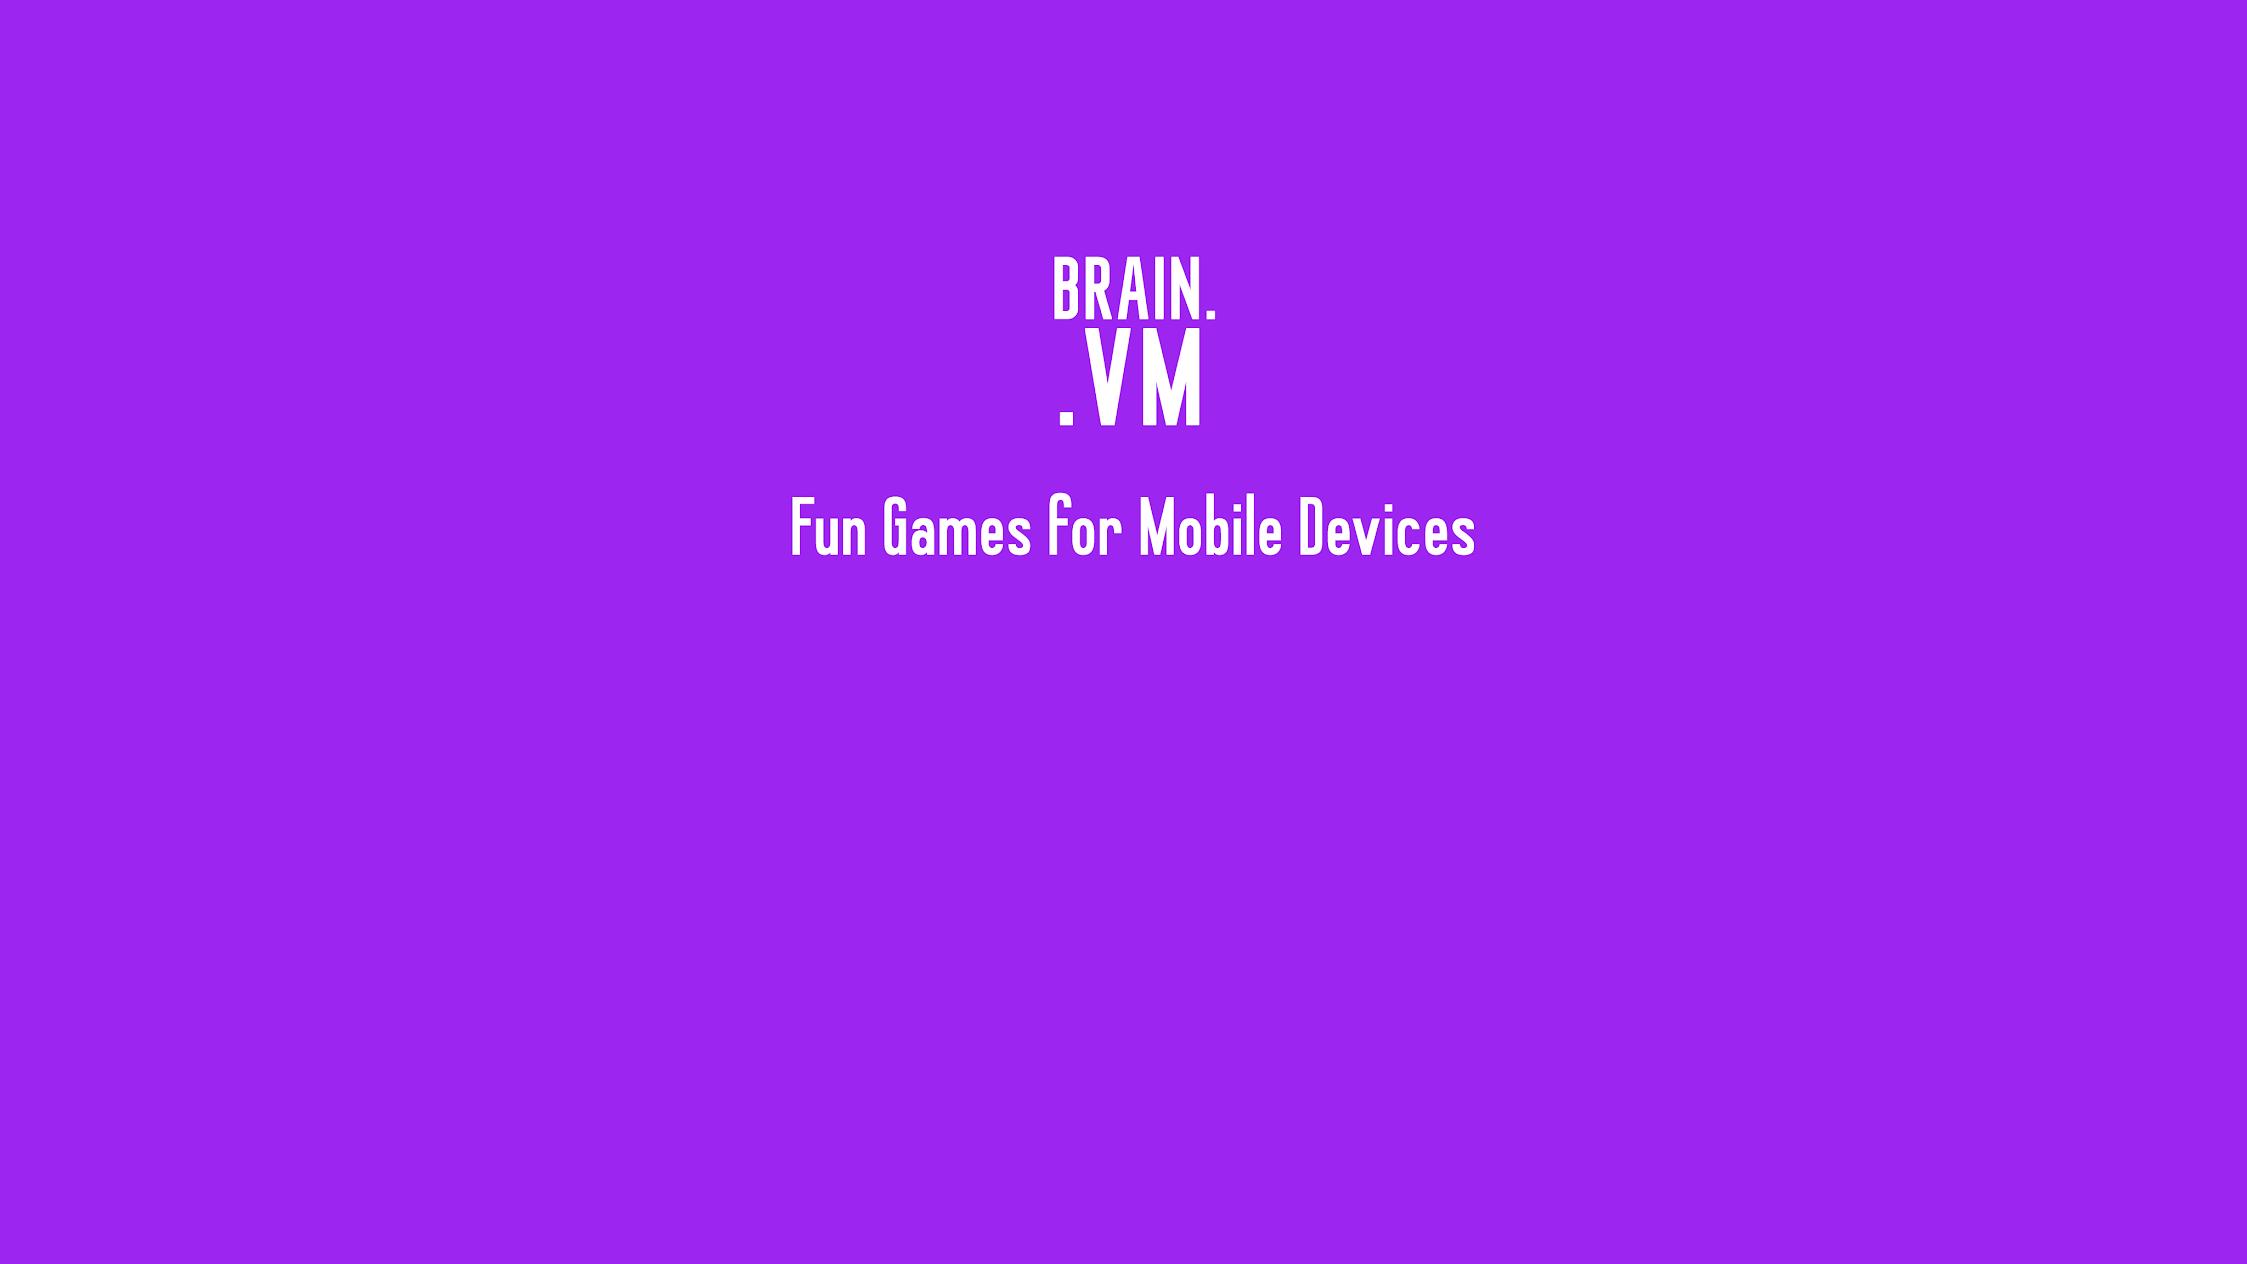 BrainVM Games